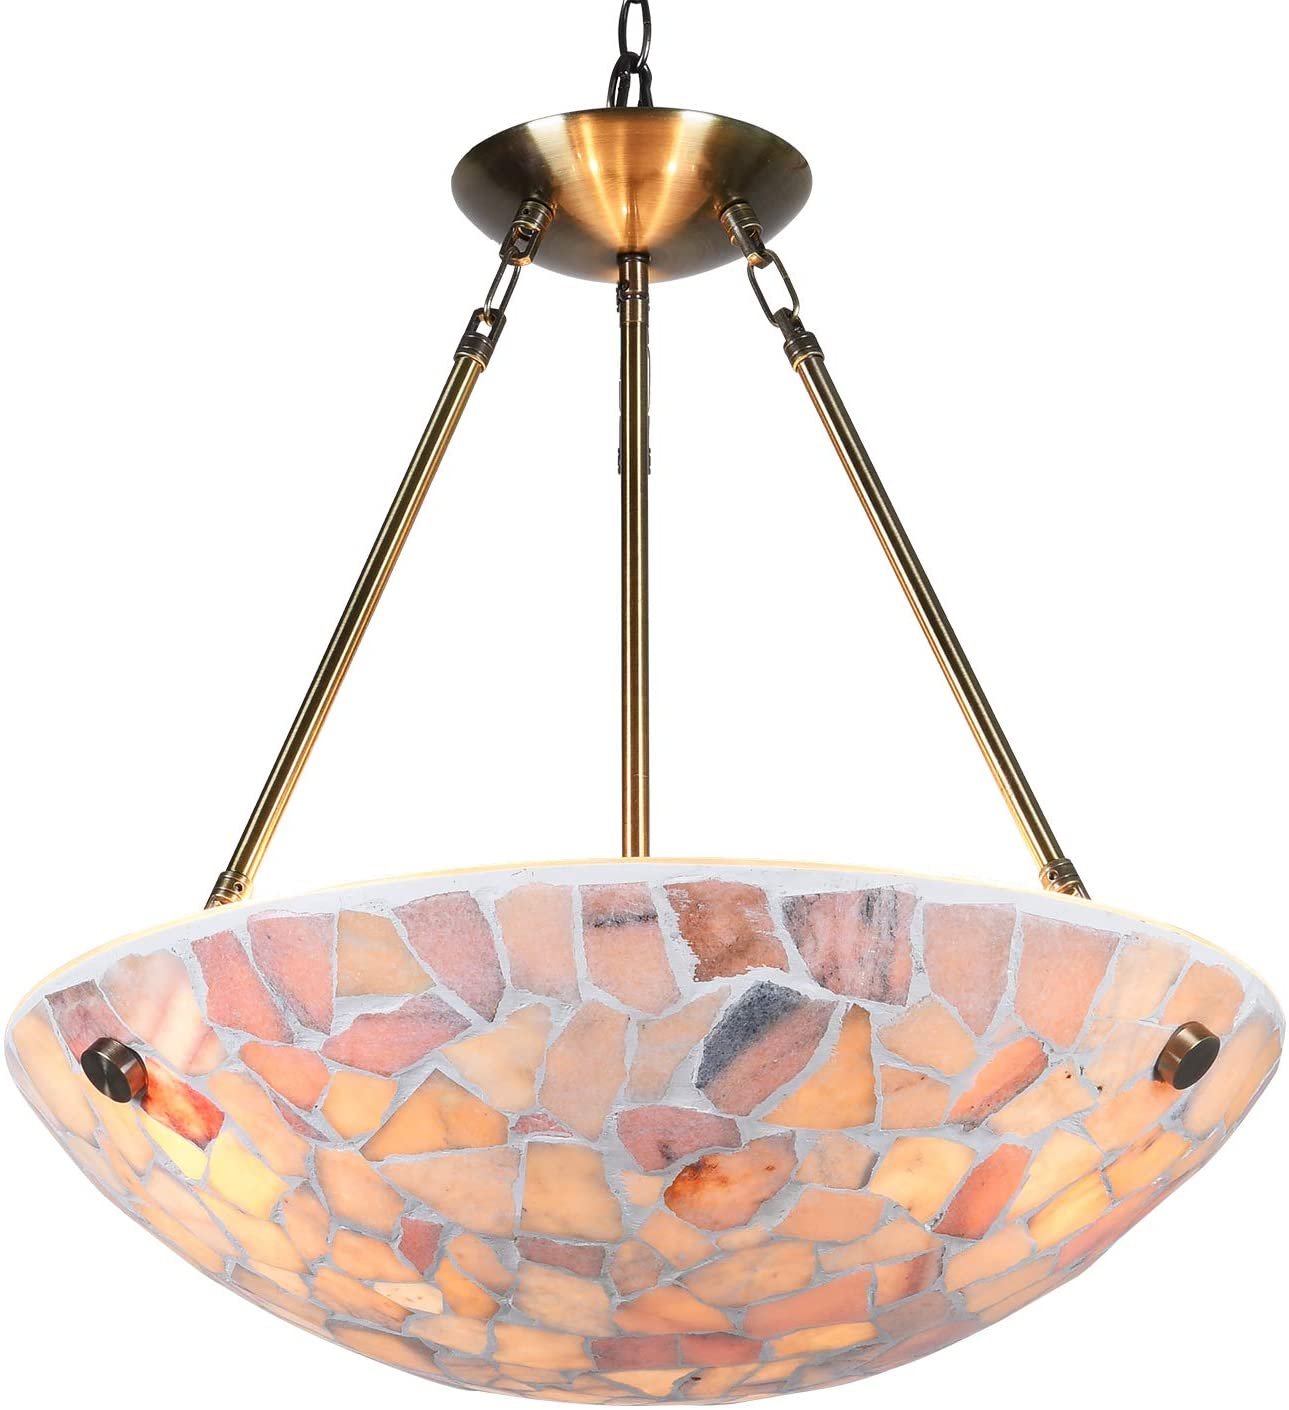 Artzone Natural Stone Mosaic Pendant Lighting for Kitchen Island, Pendant Light, Dining Room Lighting Fixtures Hanging (20PU1004)